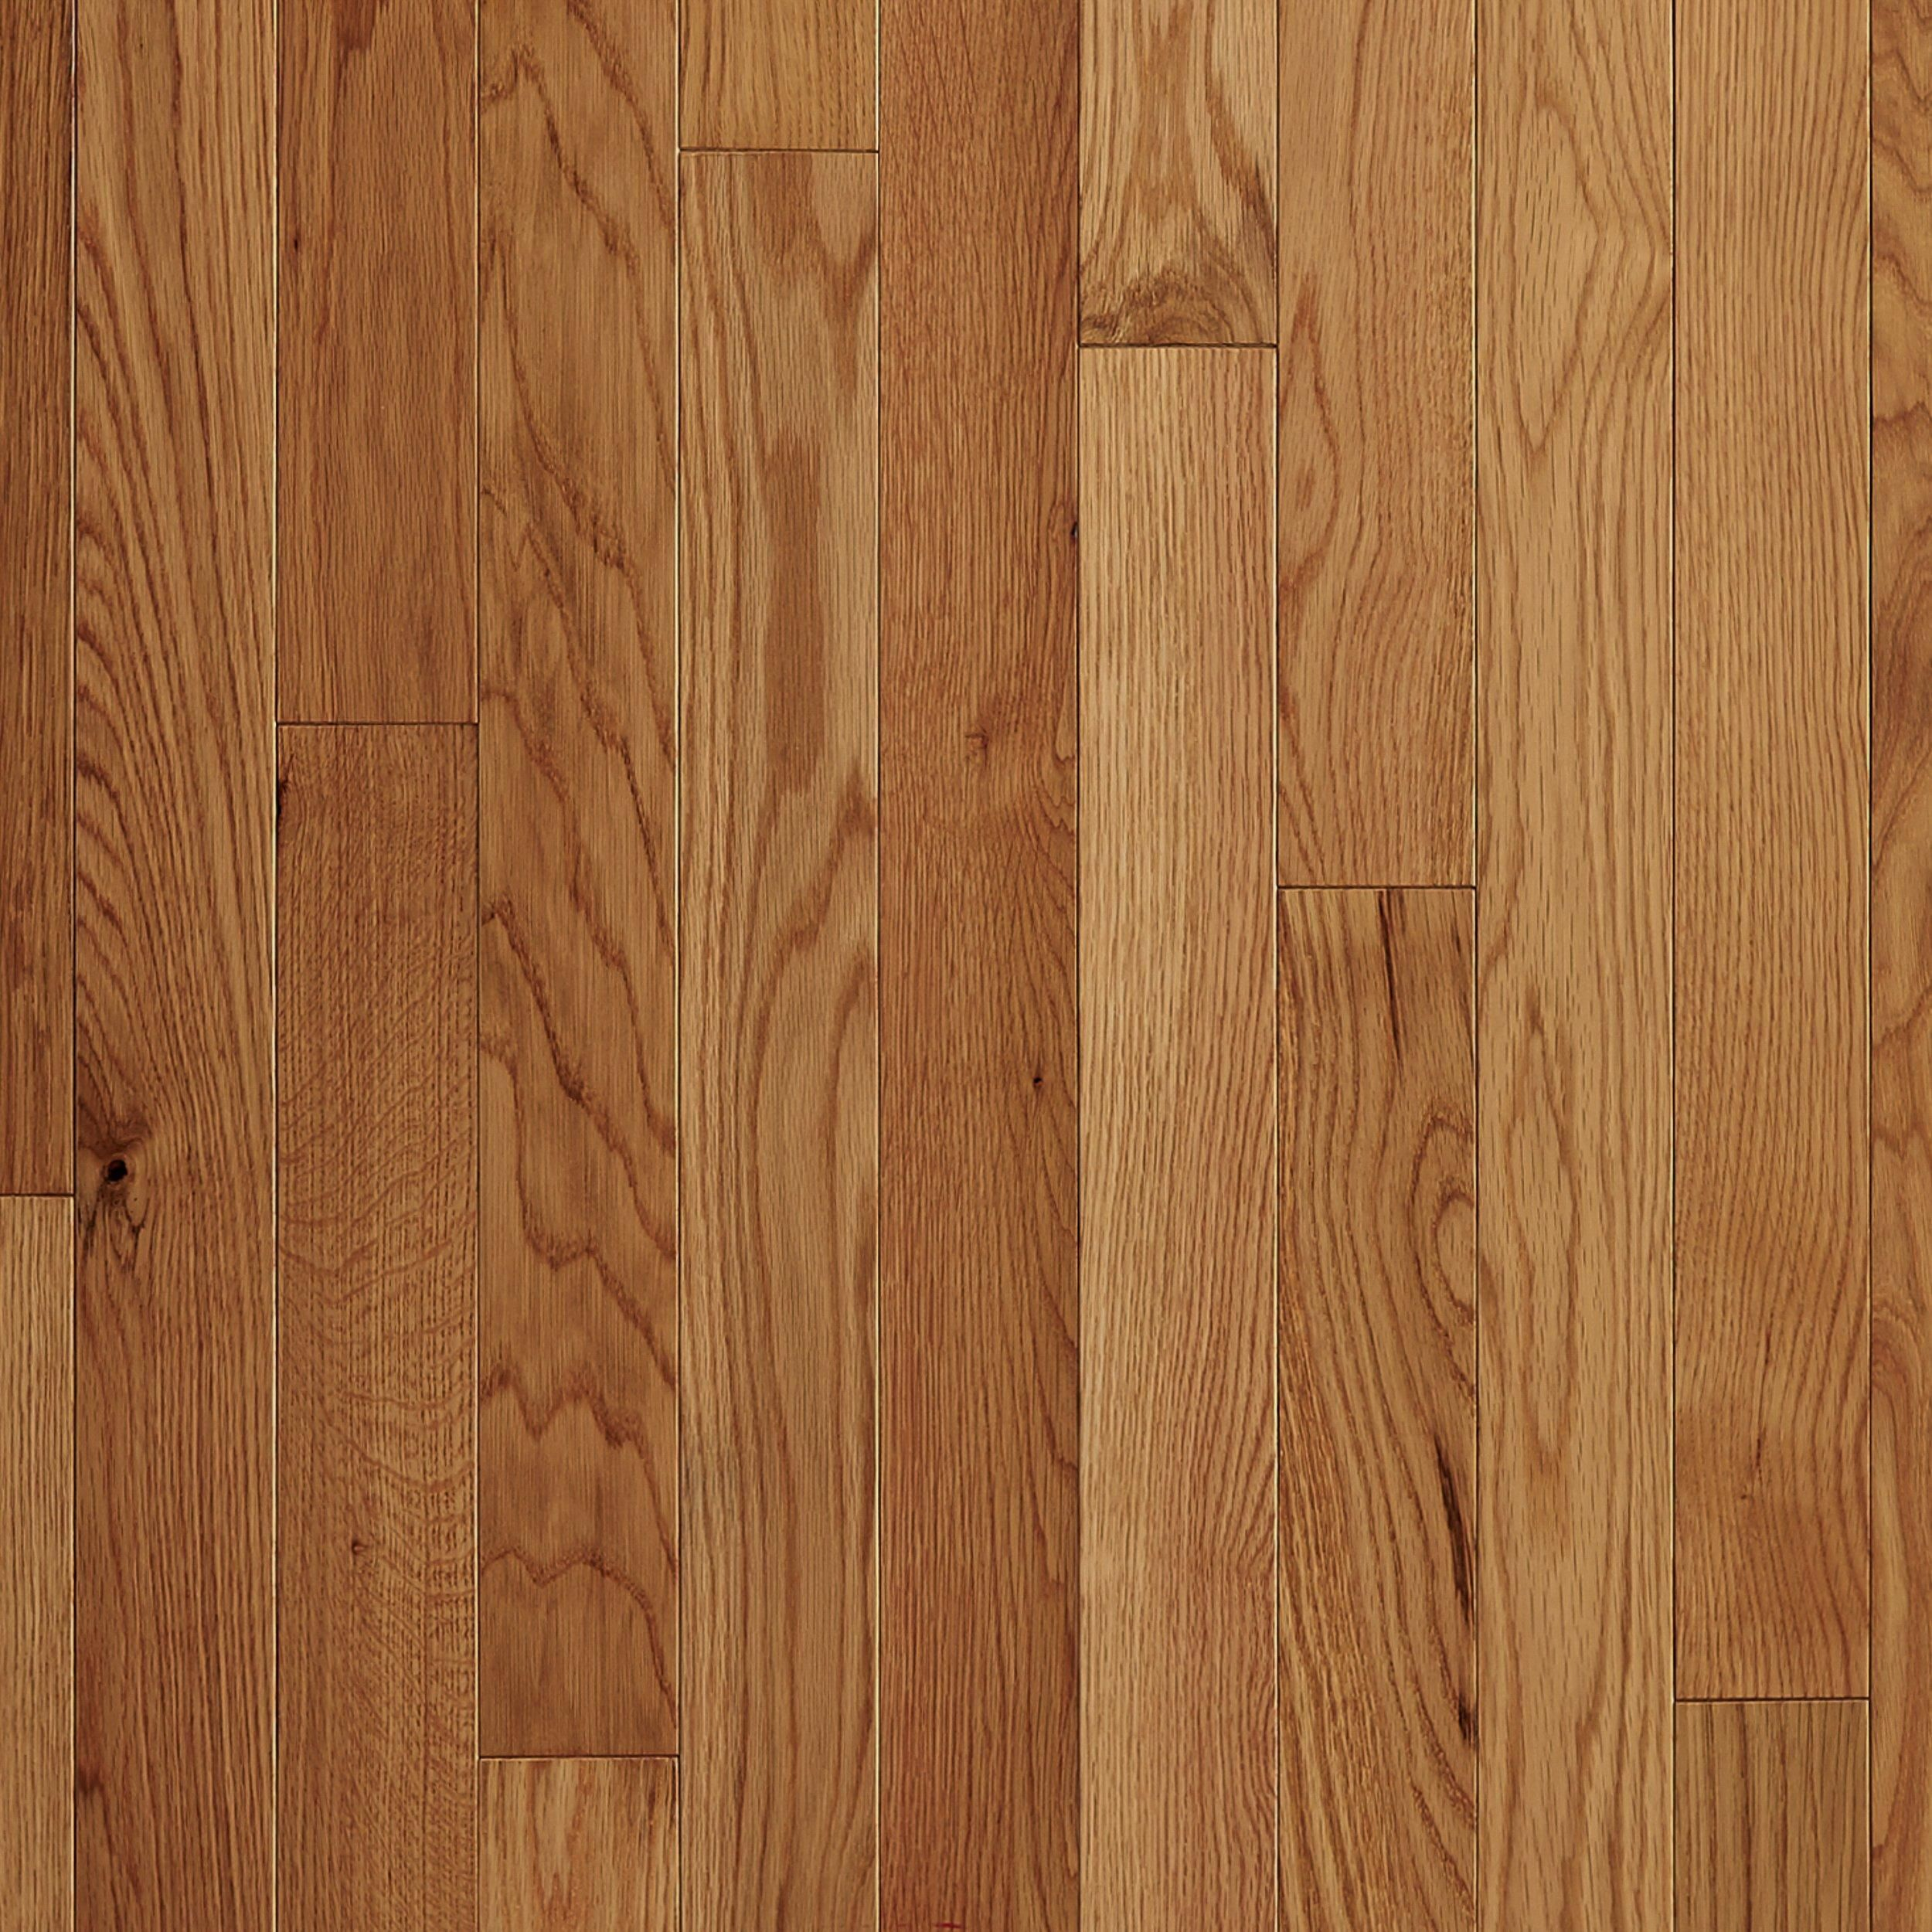 Natural White Oak Smooth Solid Hardwood Solid Hardwood Floors Prefinished Hardwood Prefinished Hardwood Floors